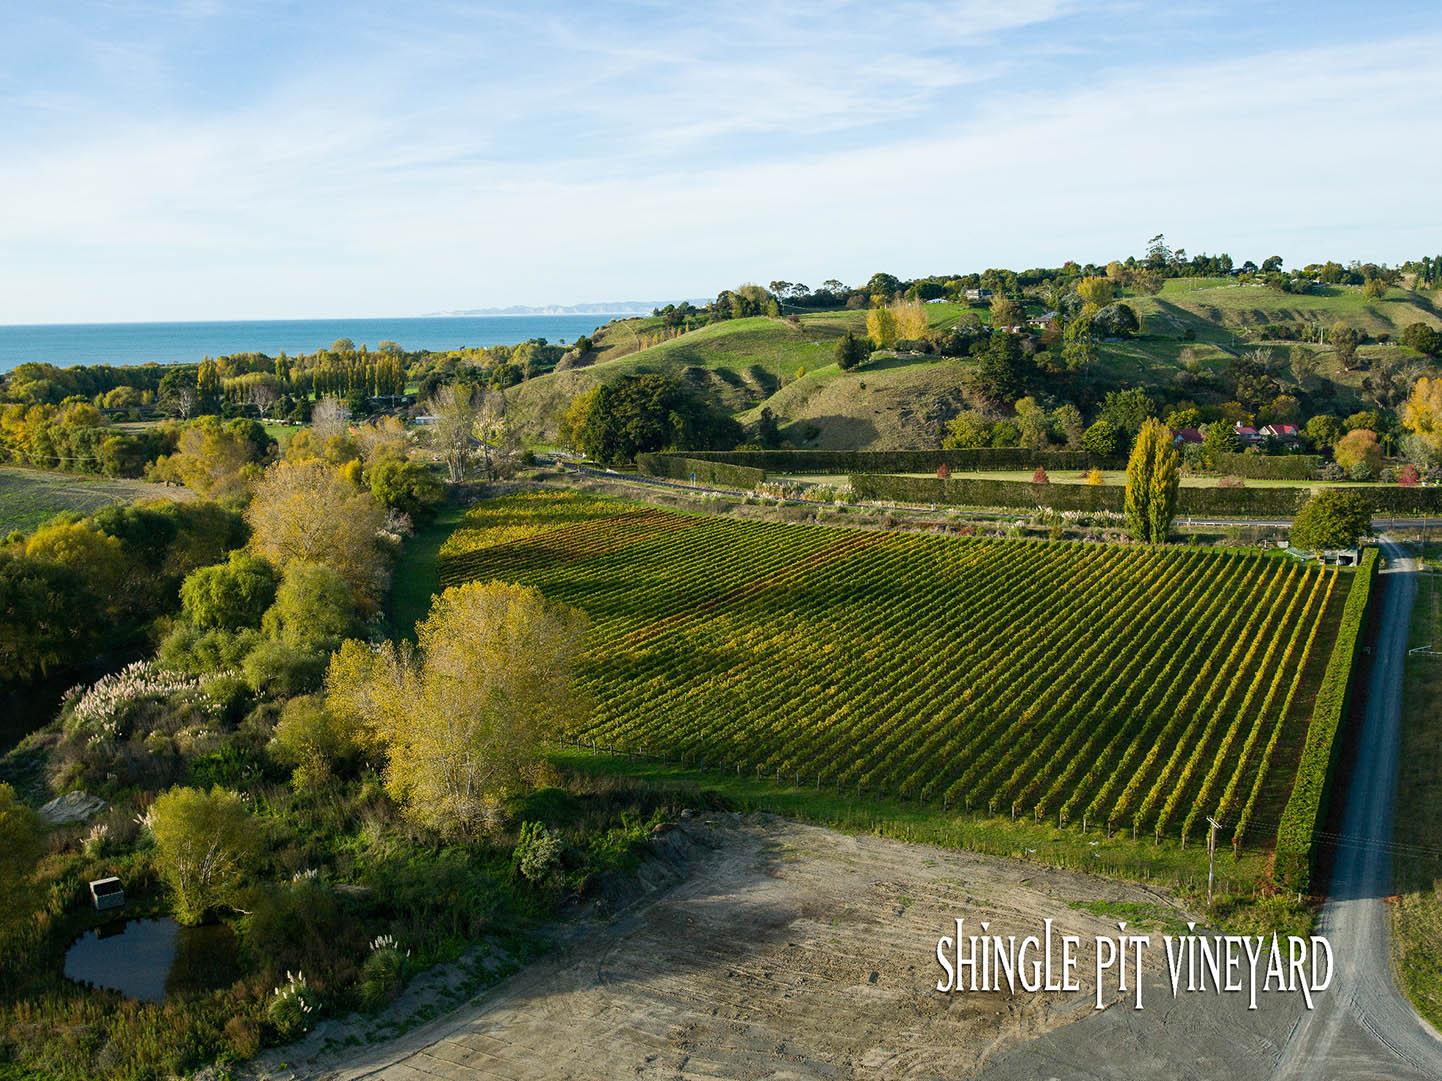 Crab Farm Winery Shingle Pit Vineyard